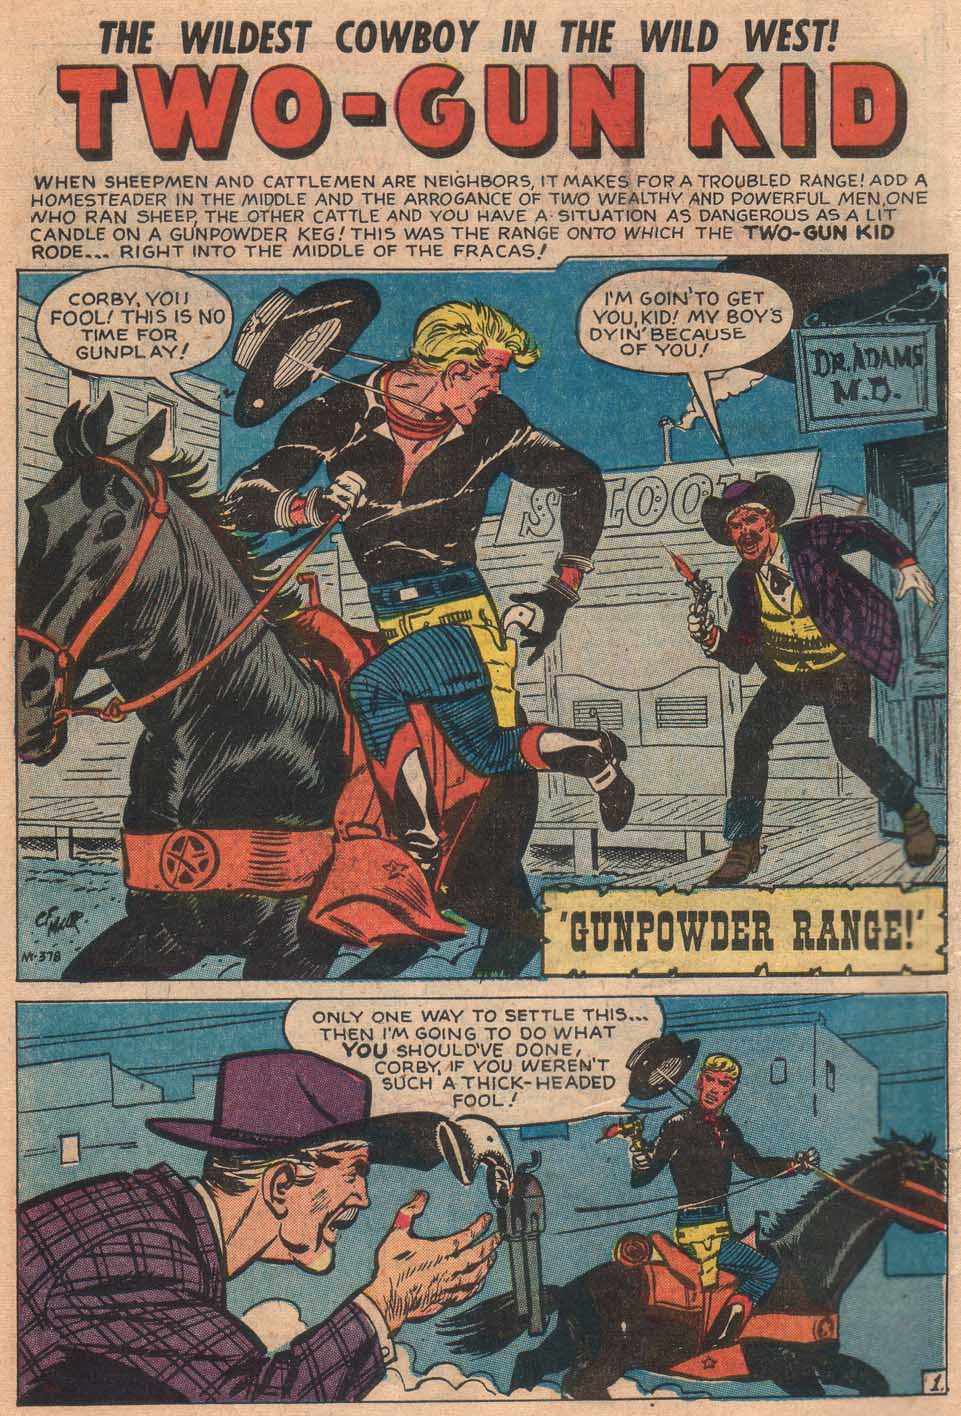 Read online Two-Gun Kid comic -  Issue #38 - 10